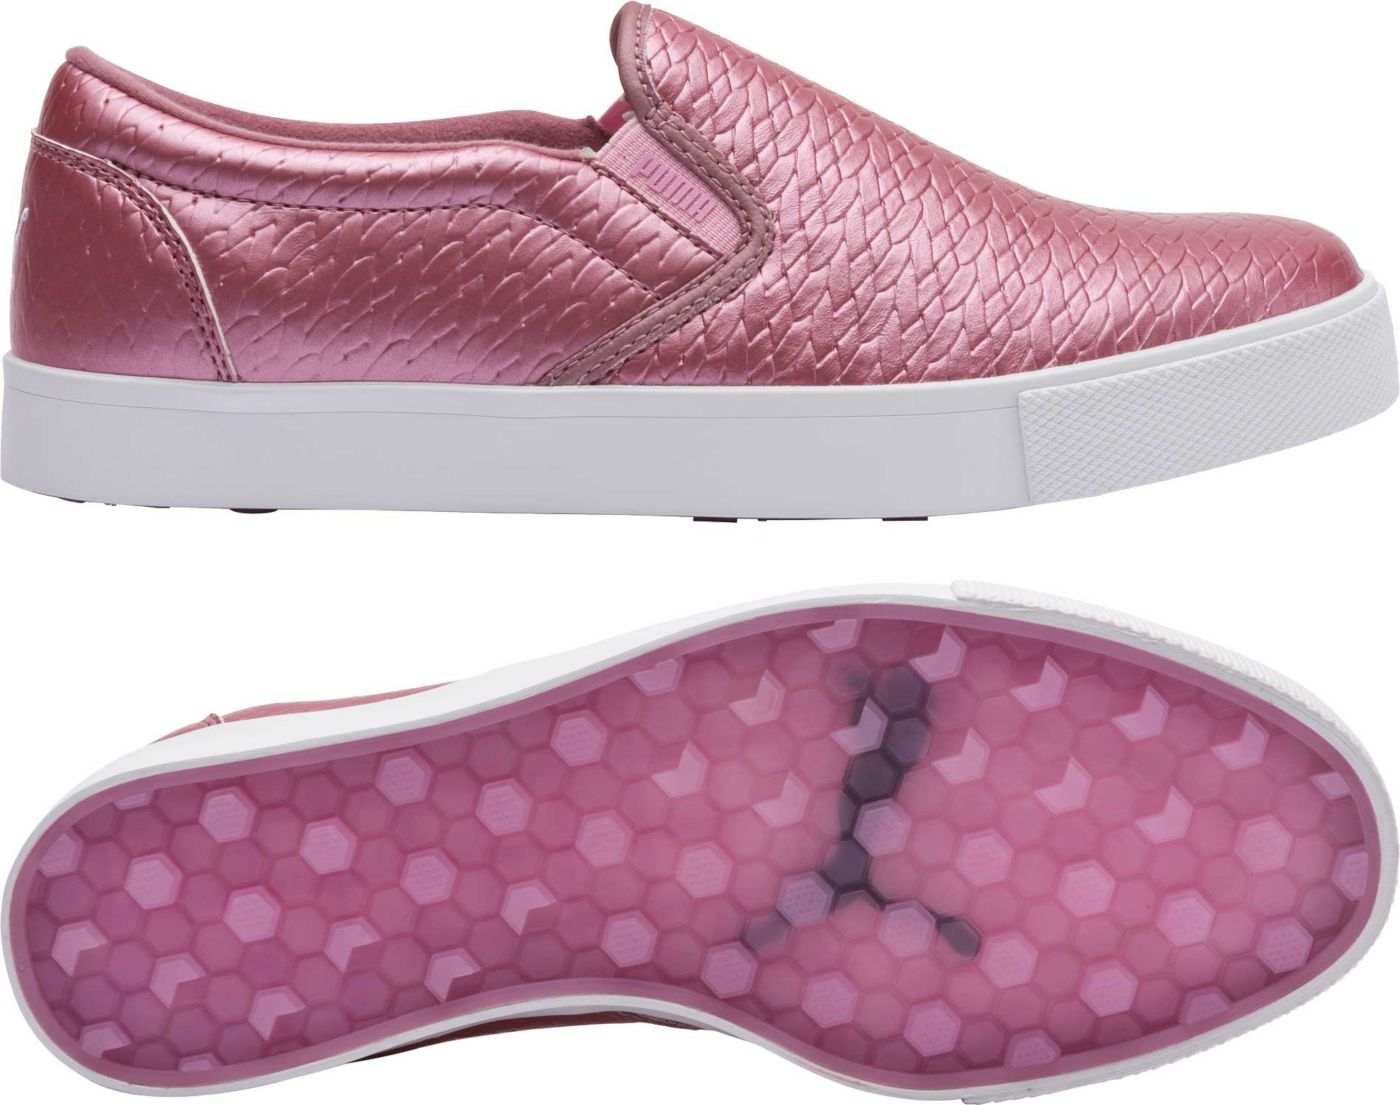 PUMA Women's Tustin Golf Shoes